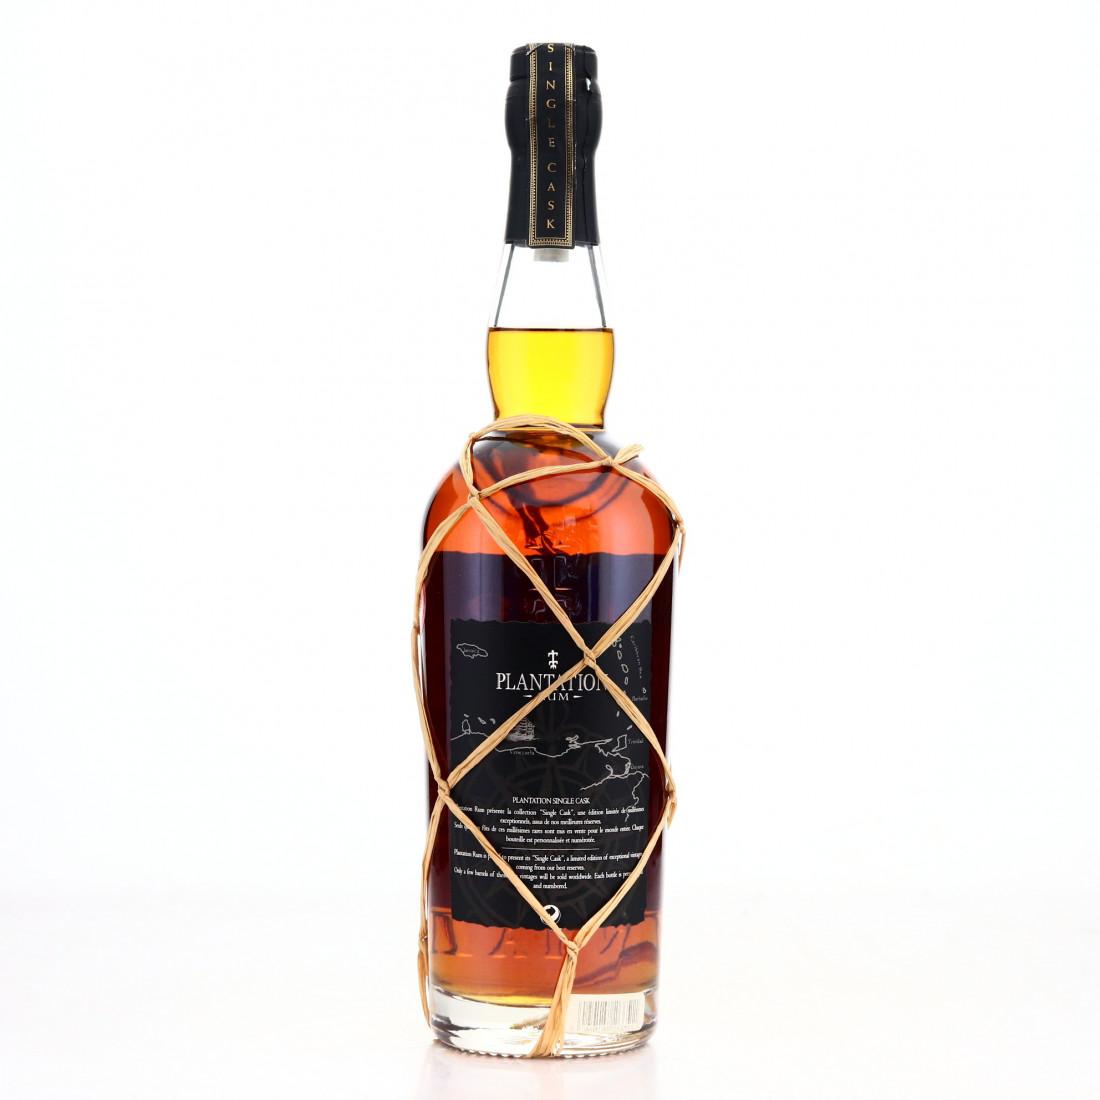 Trinidad Rum 1999 Plantation Single Cask #1 / Alexandre Gabriel UK Selection